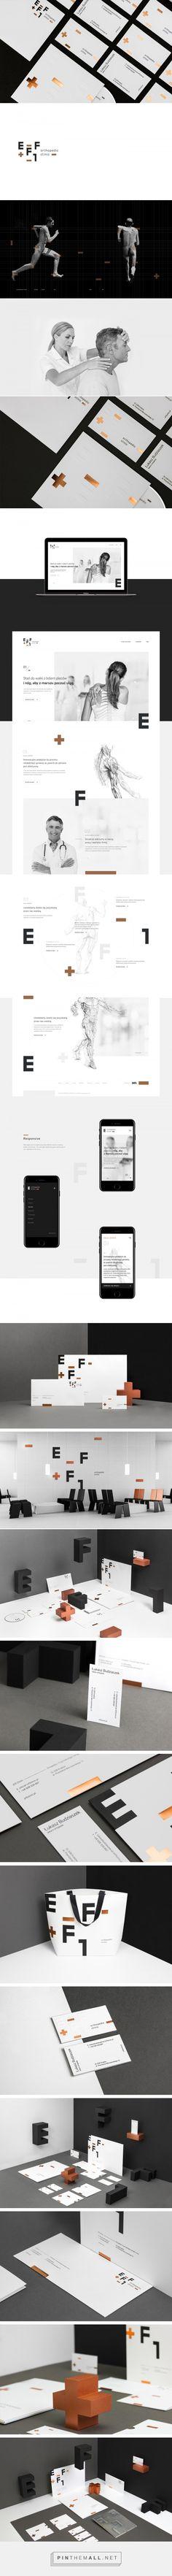 EFFI Orthopedic Clinic Branding by 247 Studio | Fivestar Branding Agency – Design and Branding Agency & Curated Inspiration Gallery